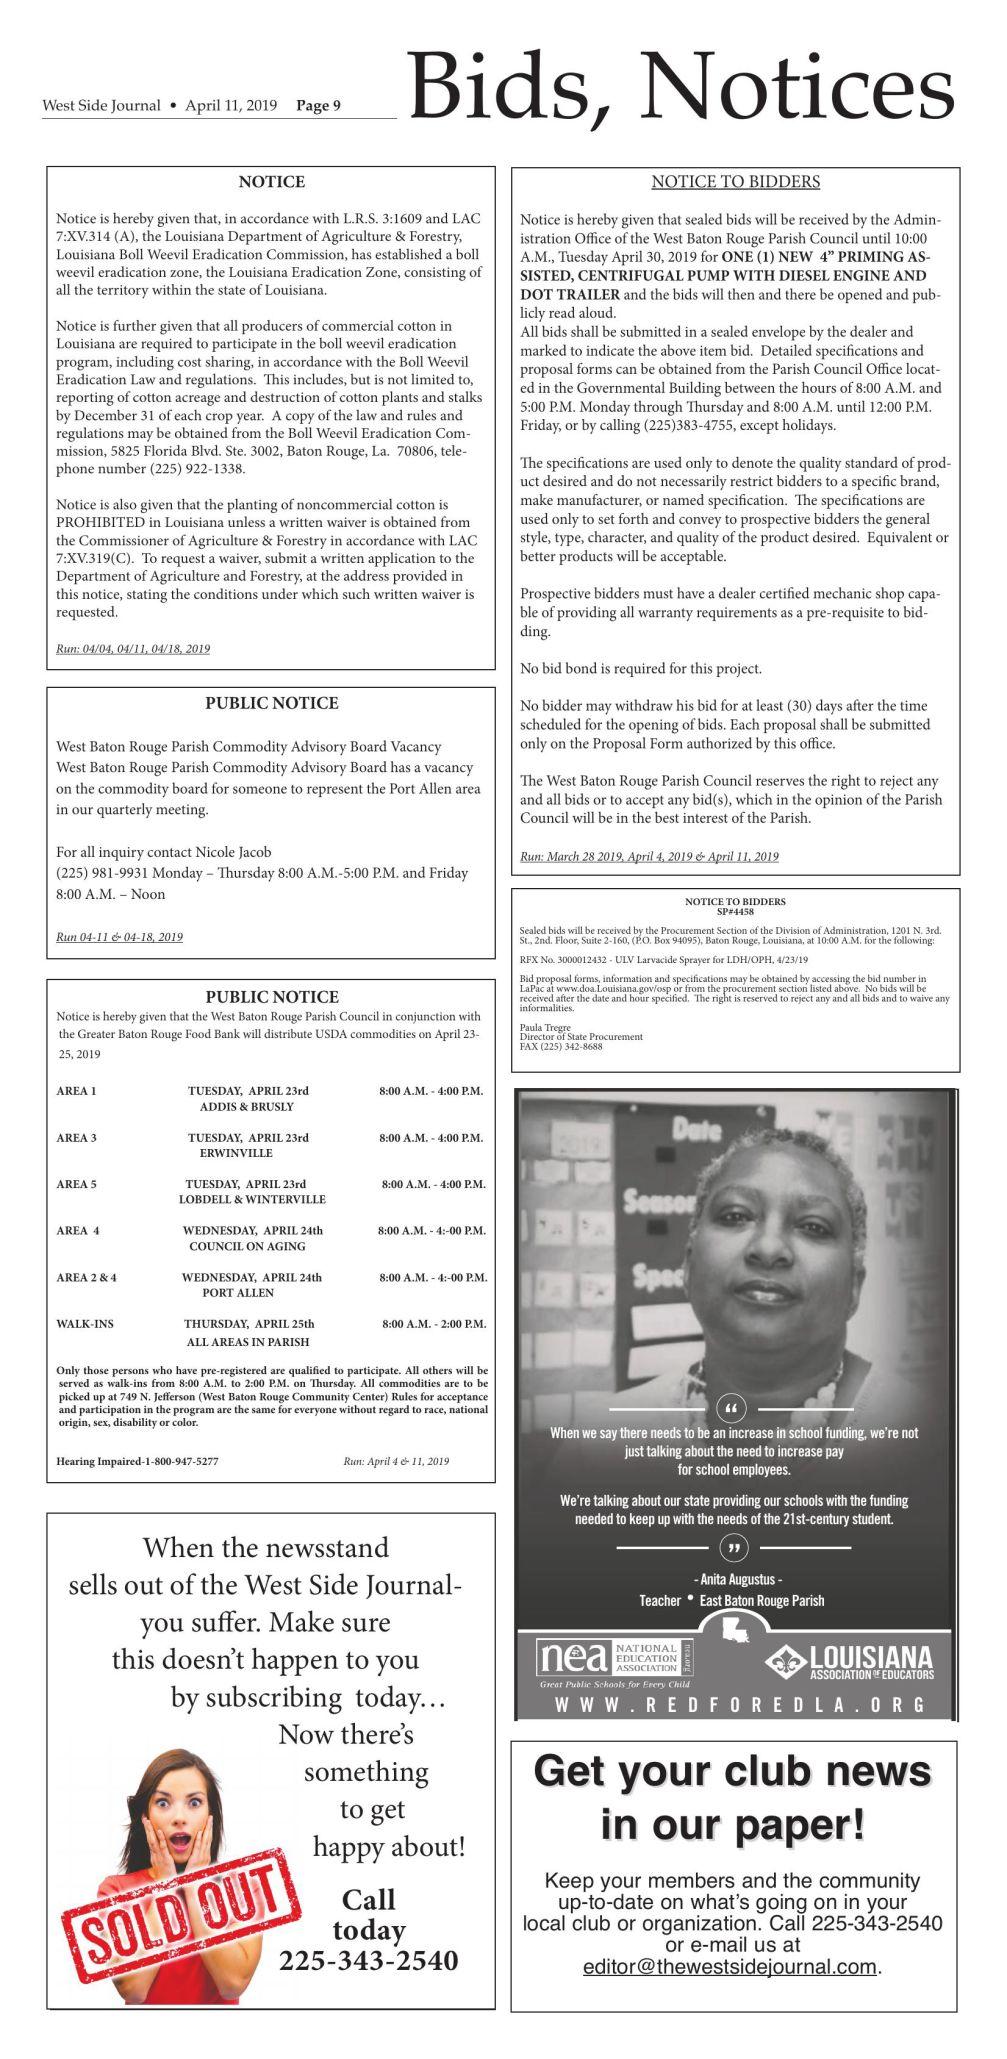 Bids & Notices 04.11.19